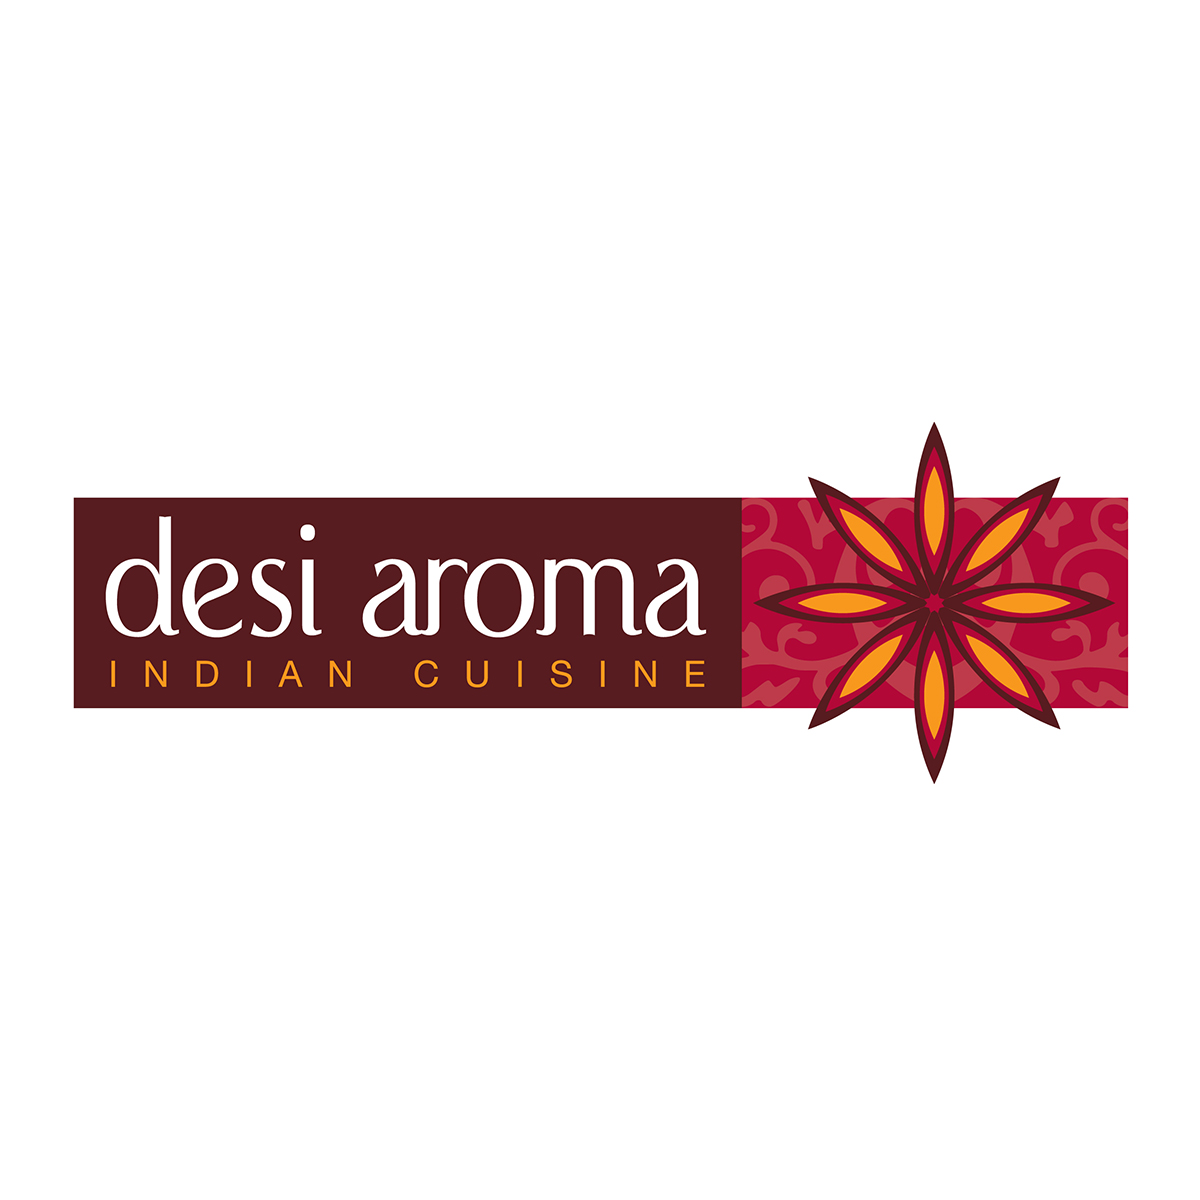 Desi Aroma logo from Canberra logo designer Fresh Creative